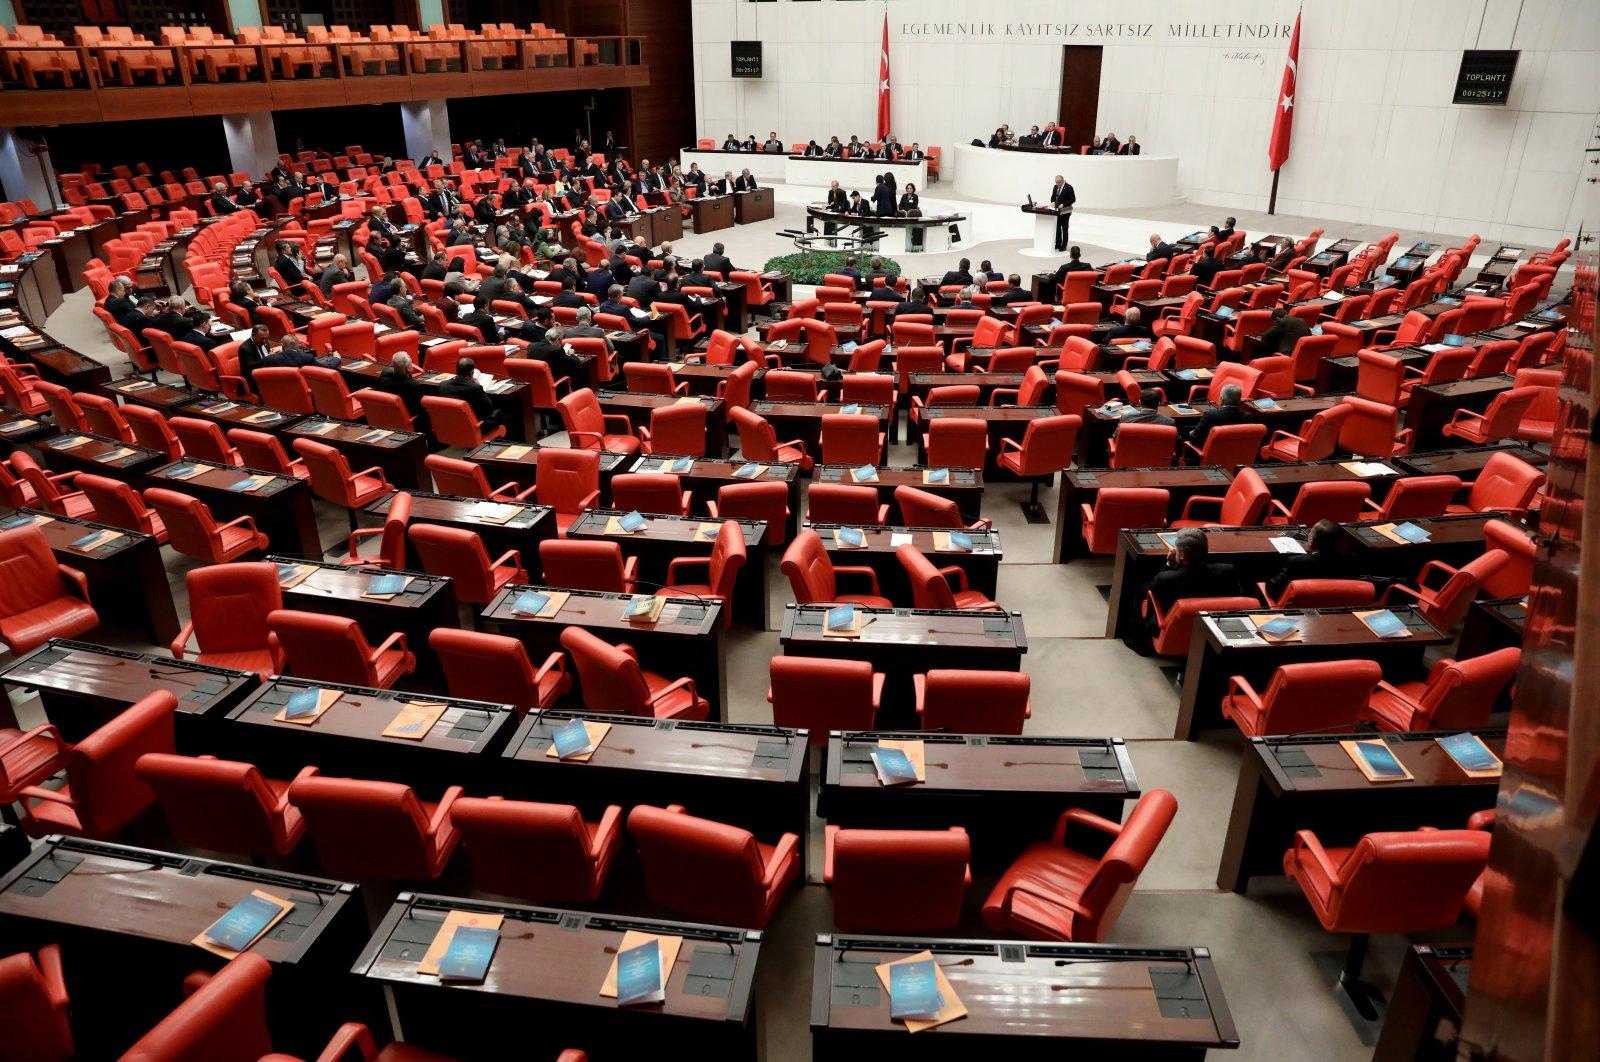 Turkish parliament has 600 parliamentarian seats. (Photo by Ali Ekeyılmaz)